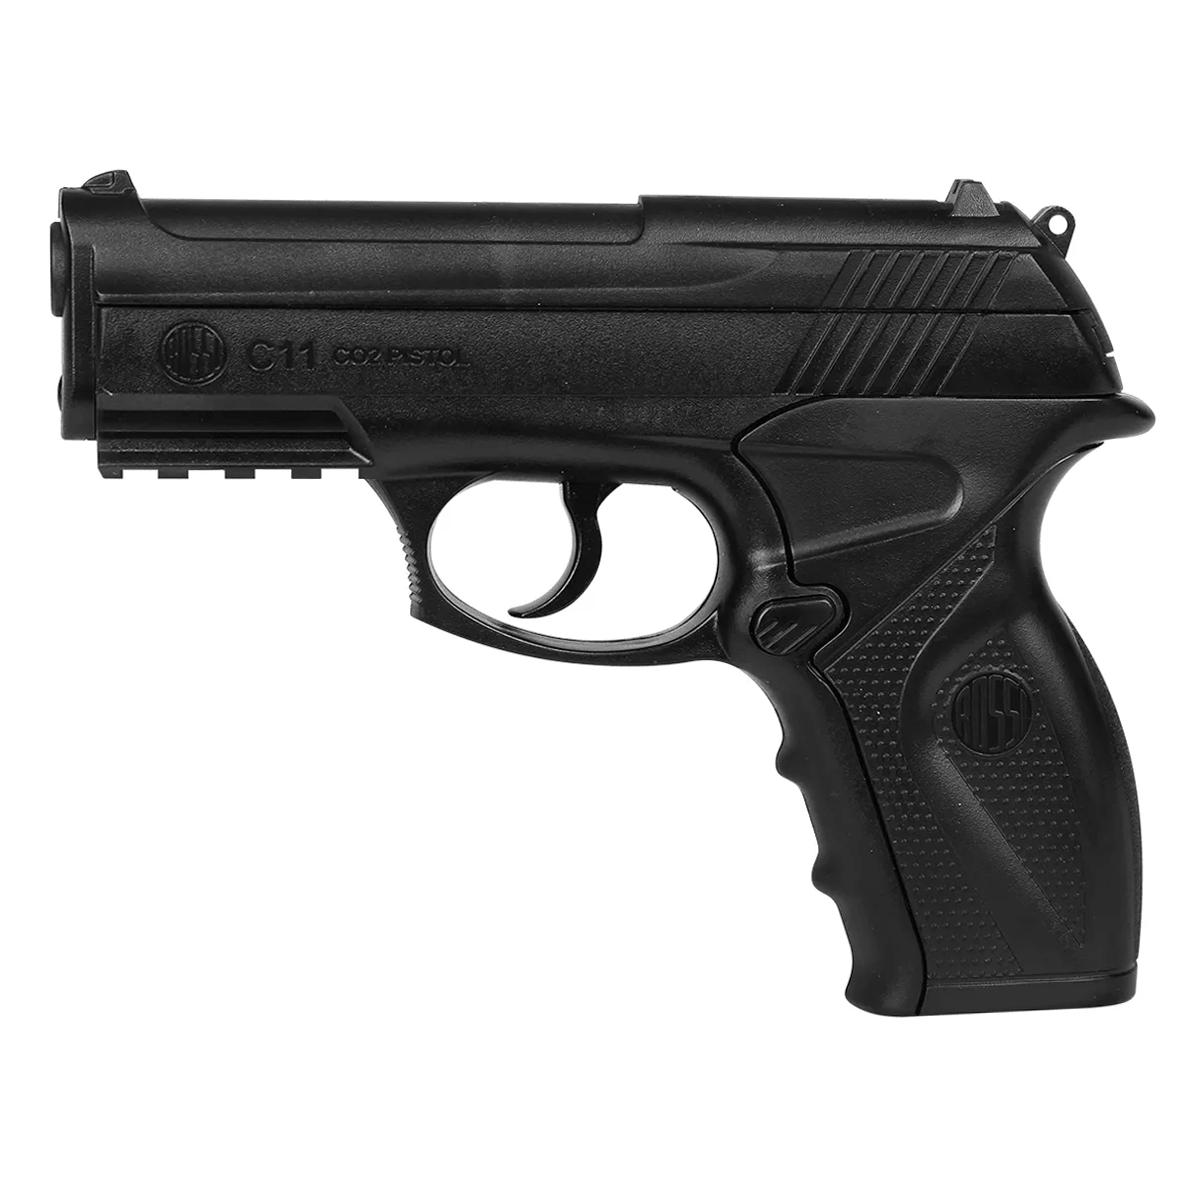 Pistola Pressão Gas Co2 Wg C11 Rossi Polímero Esferas Aço 4,5mm